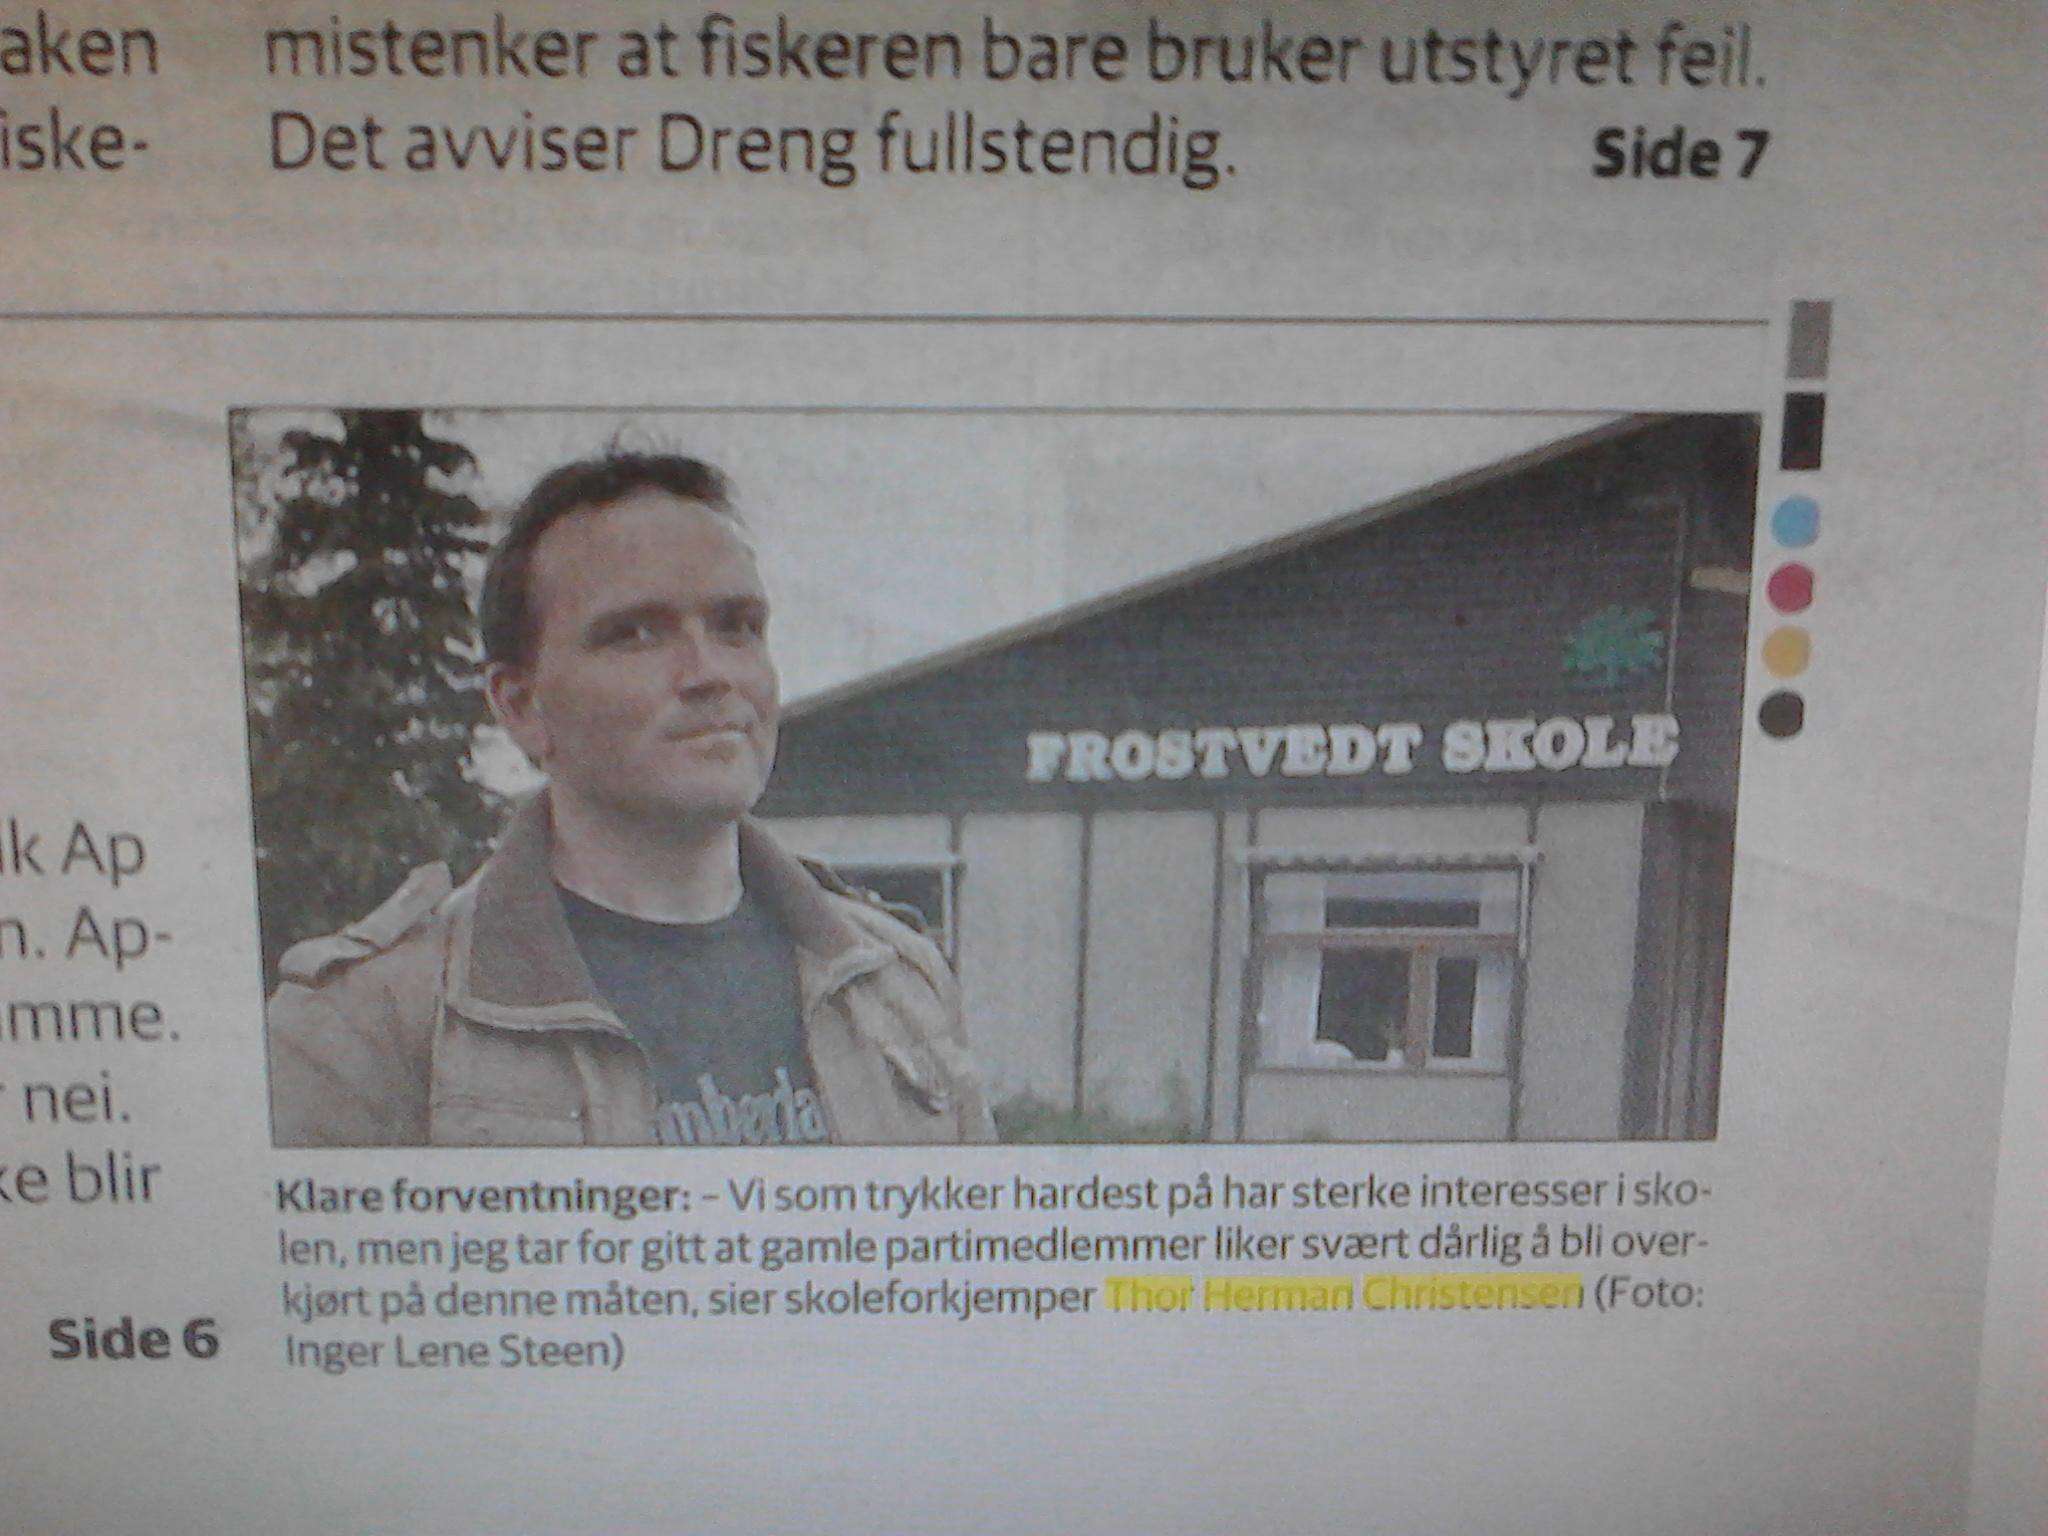 dd151235 Han her kalte vi Herman, på 70-tallet, sånn som jeg husker det. (Fra  Østlands-Posten 14. juni 2013)